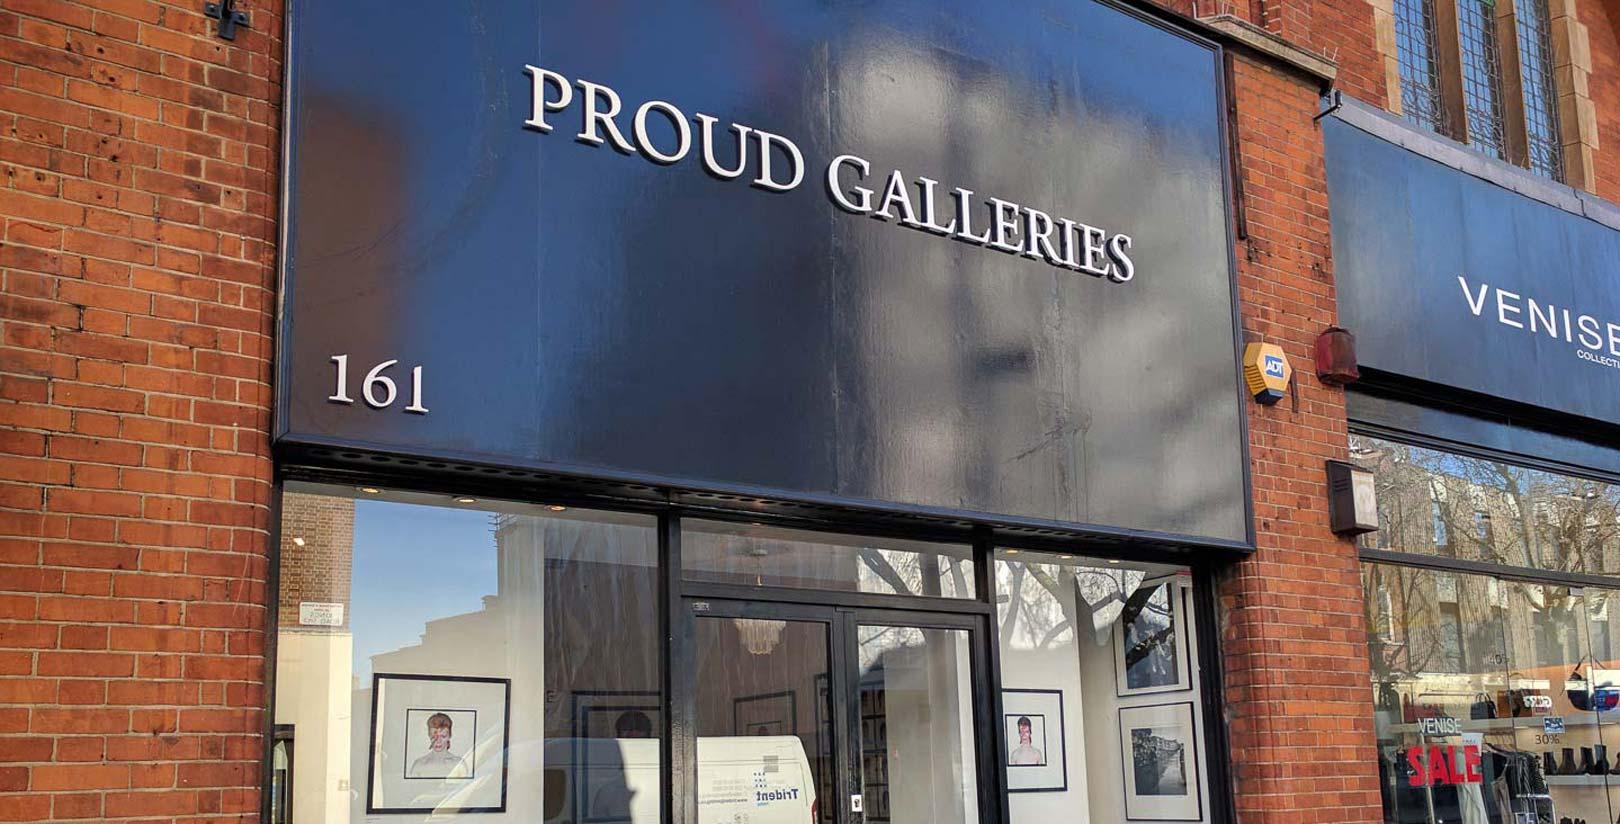 Proud Gallery